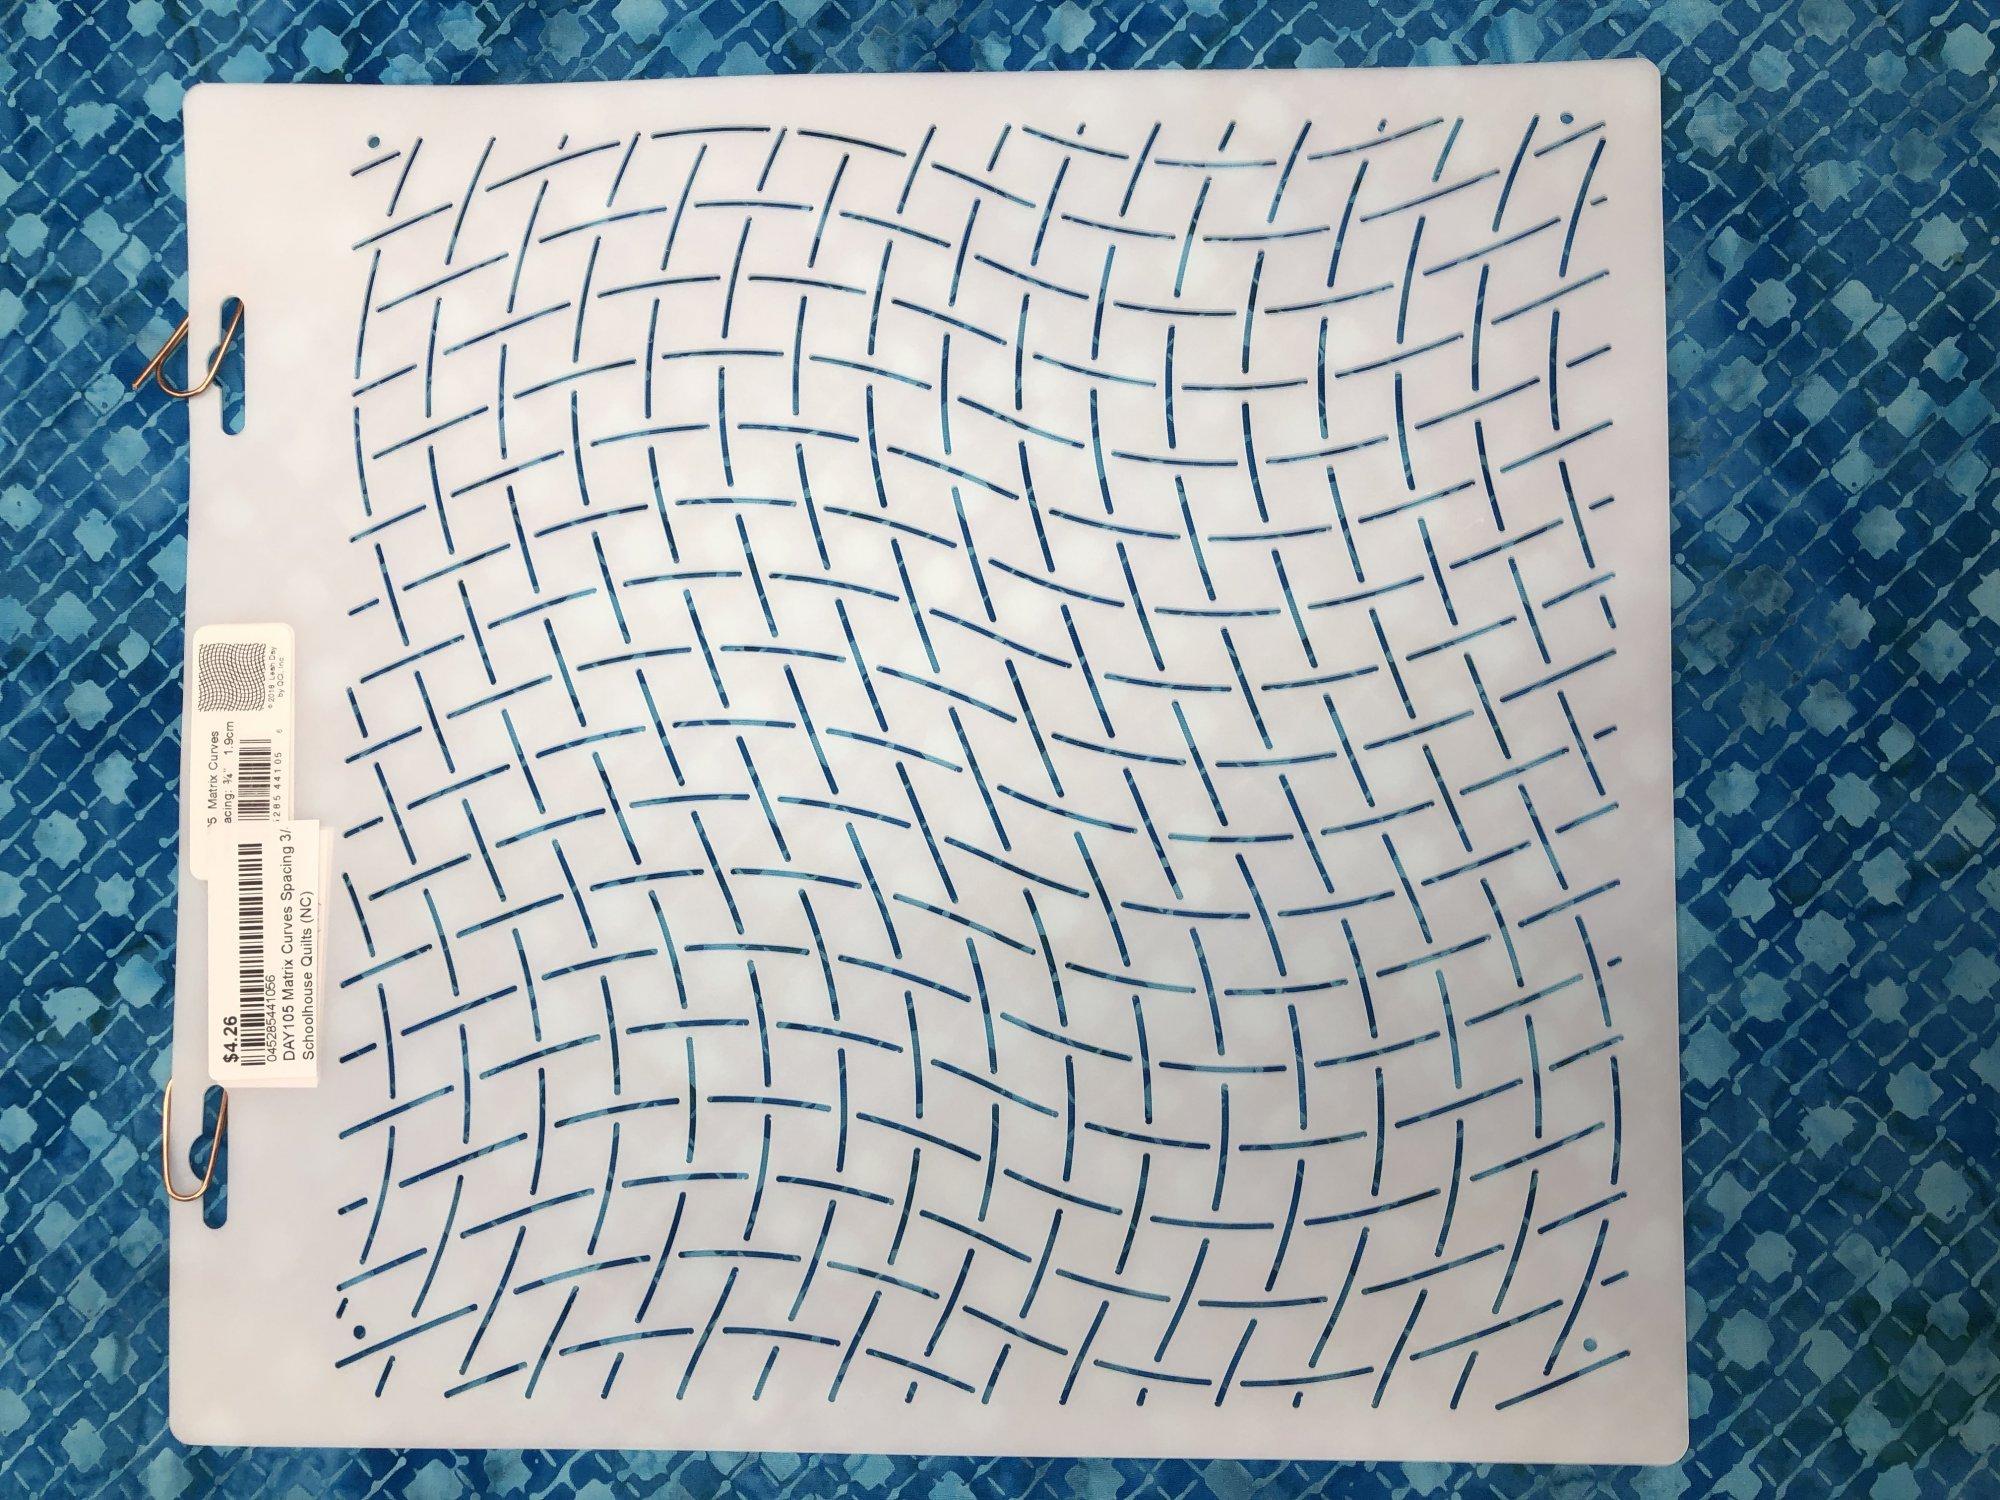 DAY105 Matrix Curves Spacing 3/4 Stencil